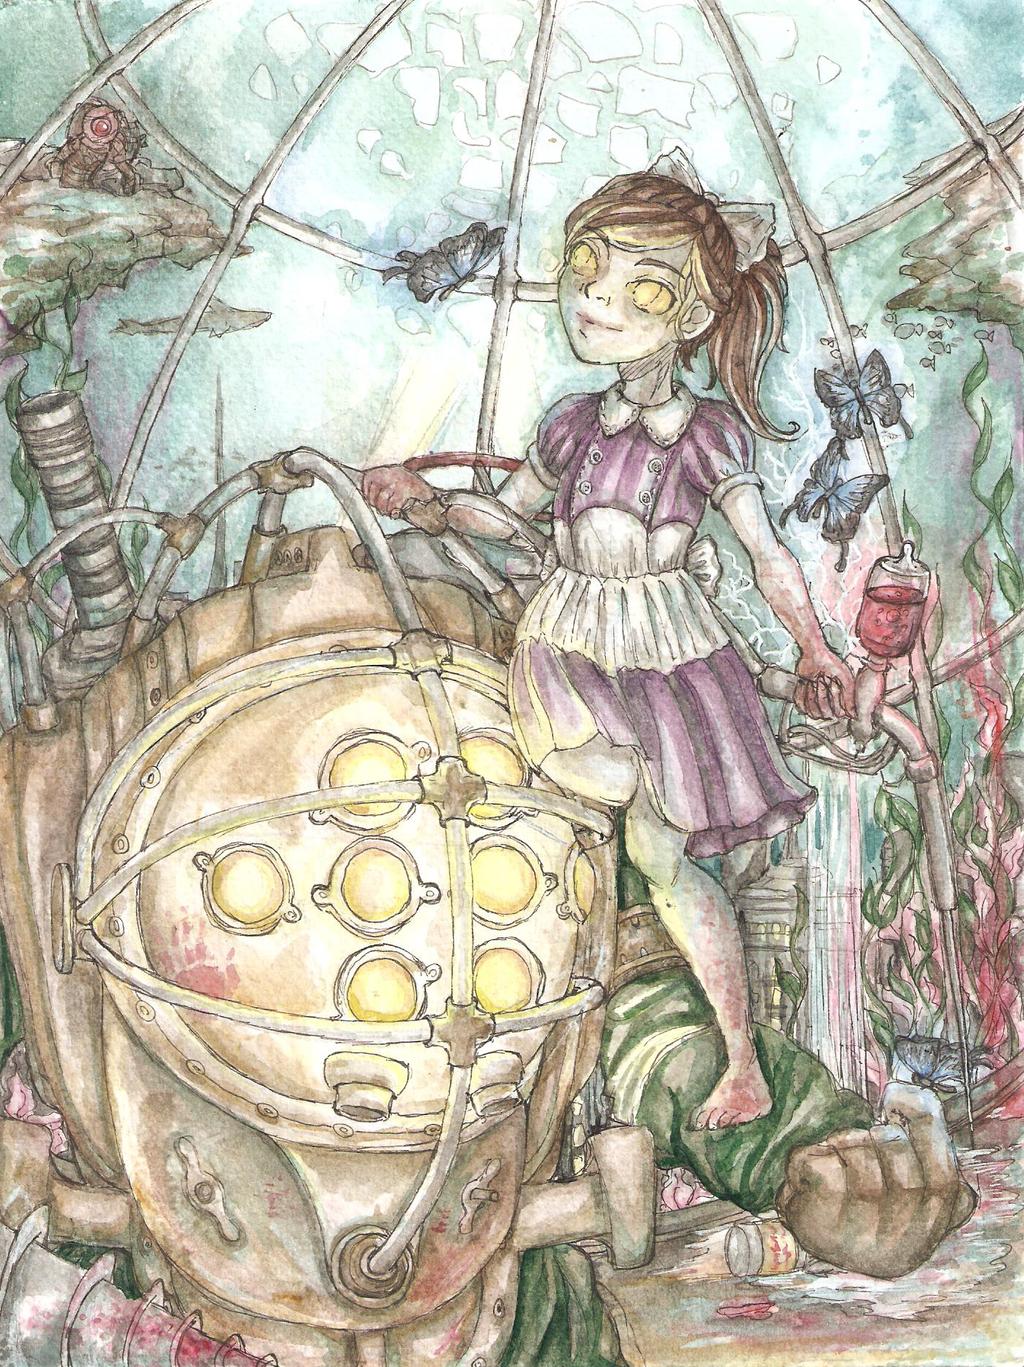 Bioshock 2: Big Daddy and Little Sister by Juvia-himesama